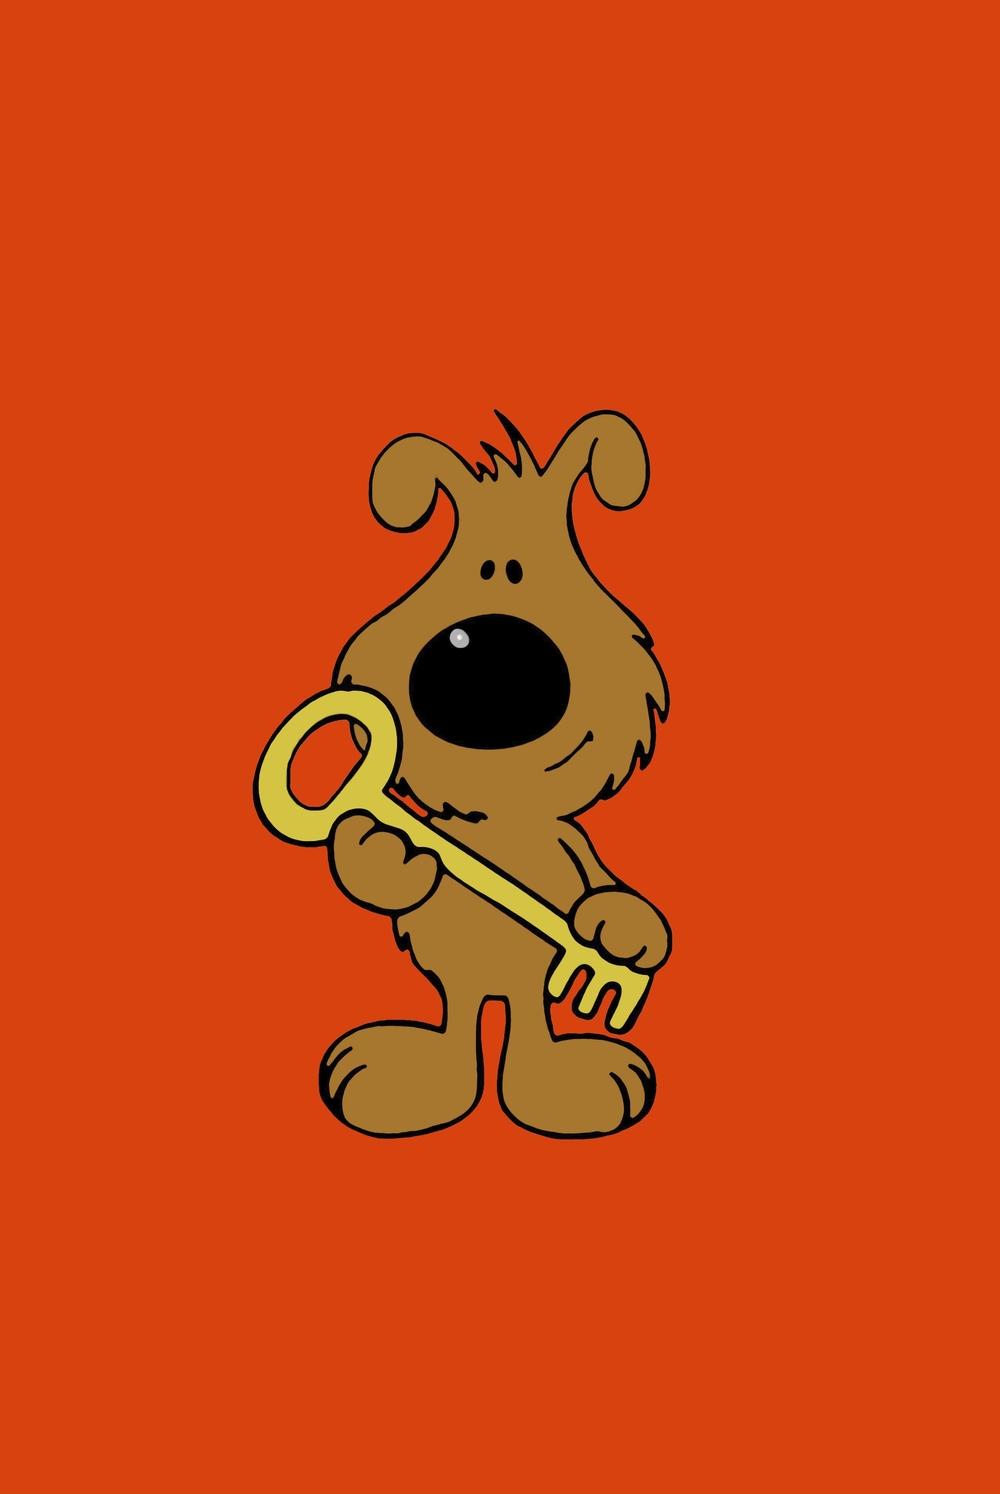 dog with key.jpg